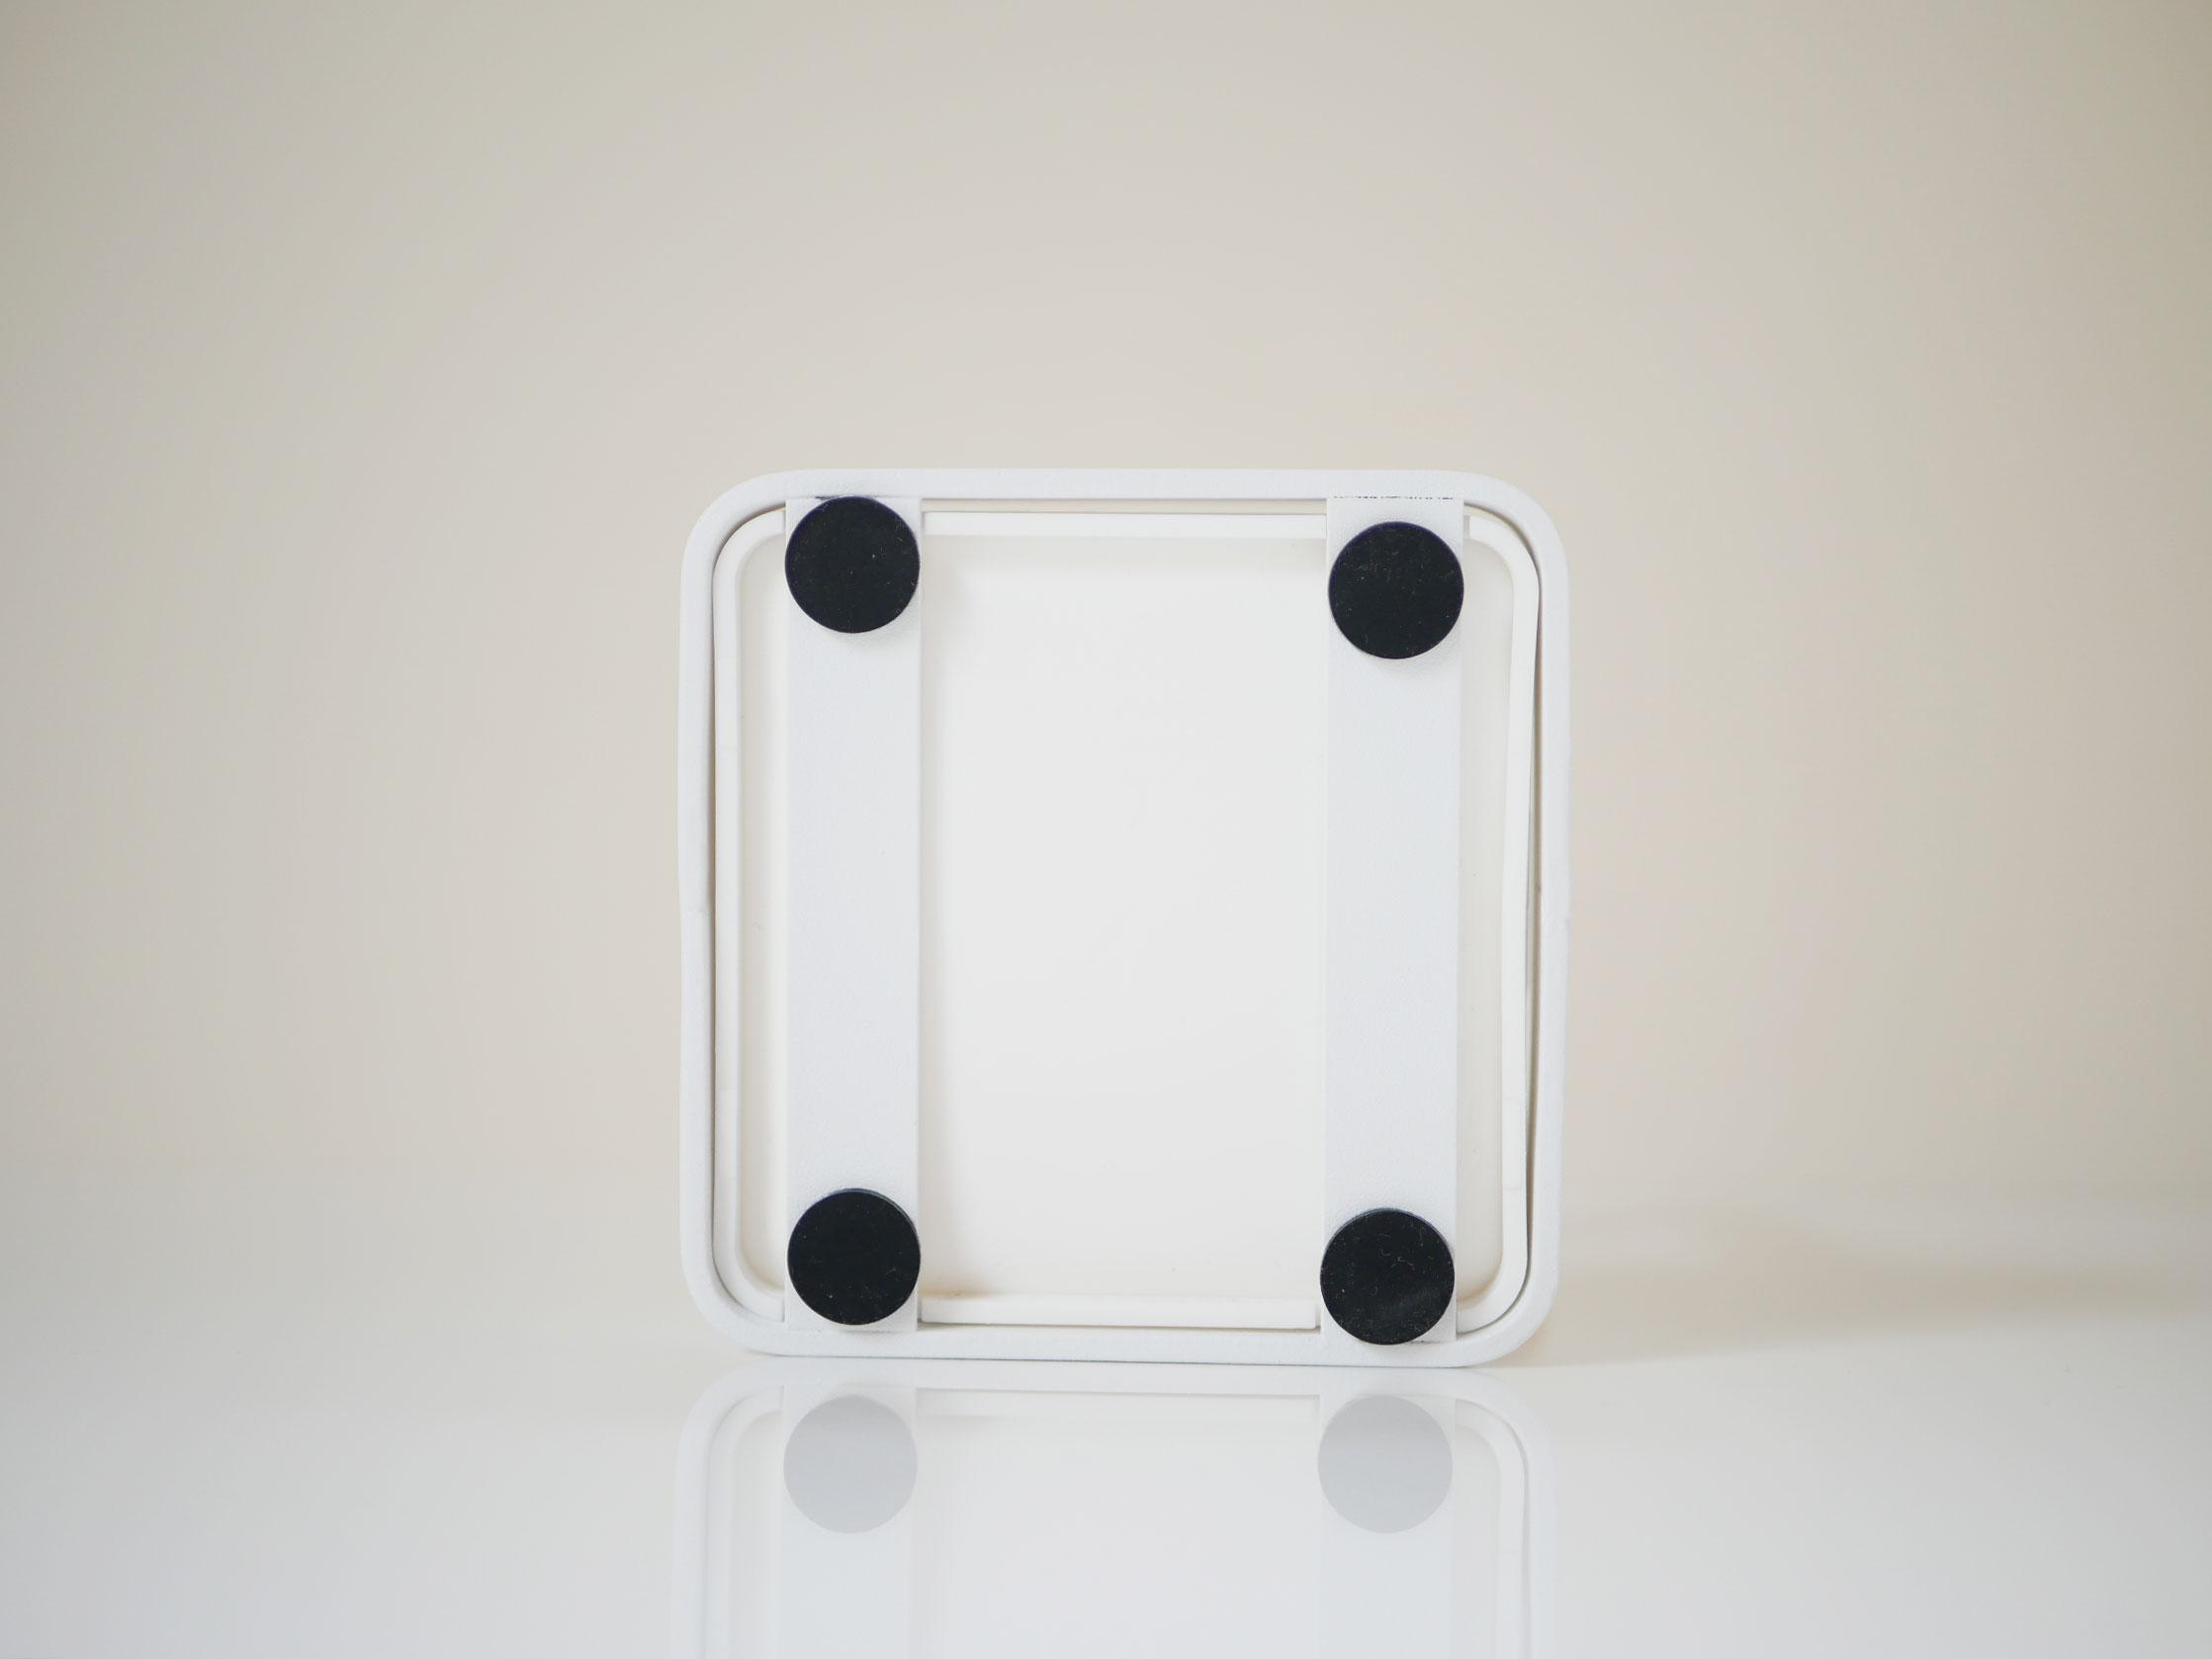 【tosca】お玉&鍋ふたスタンド ホワイト